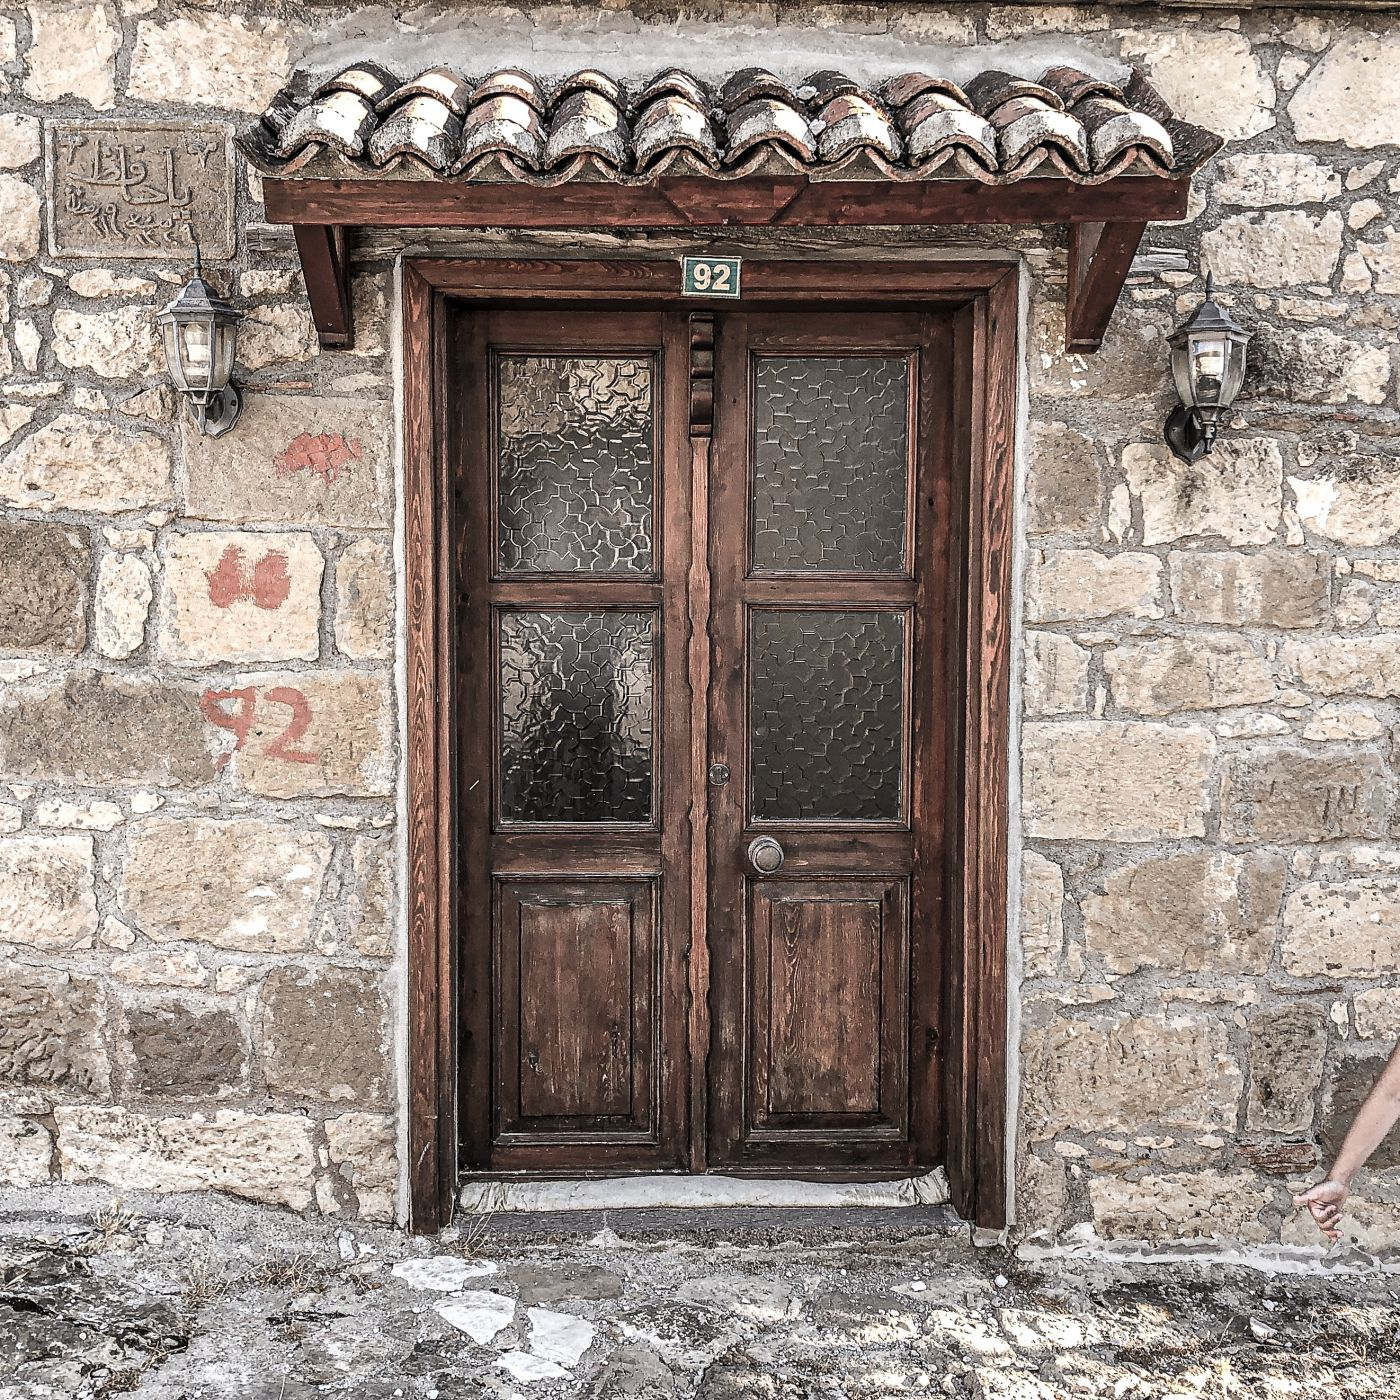 Adatepe Town, Turkey